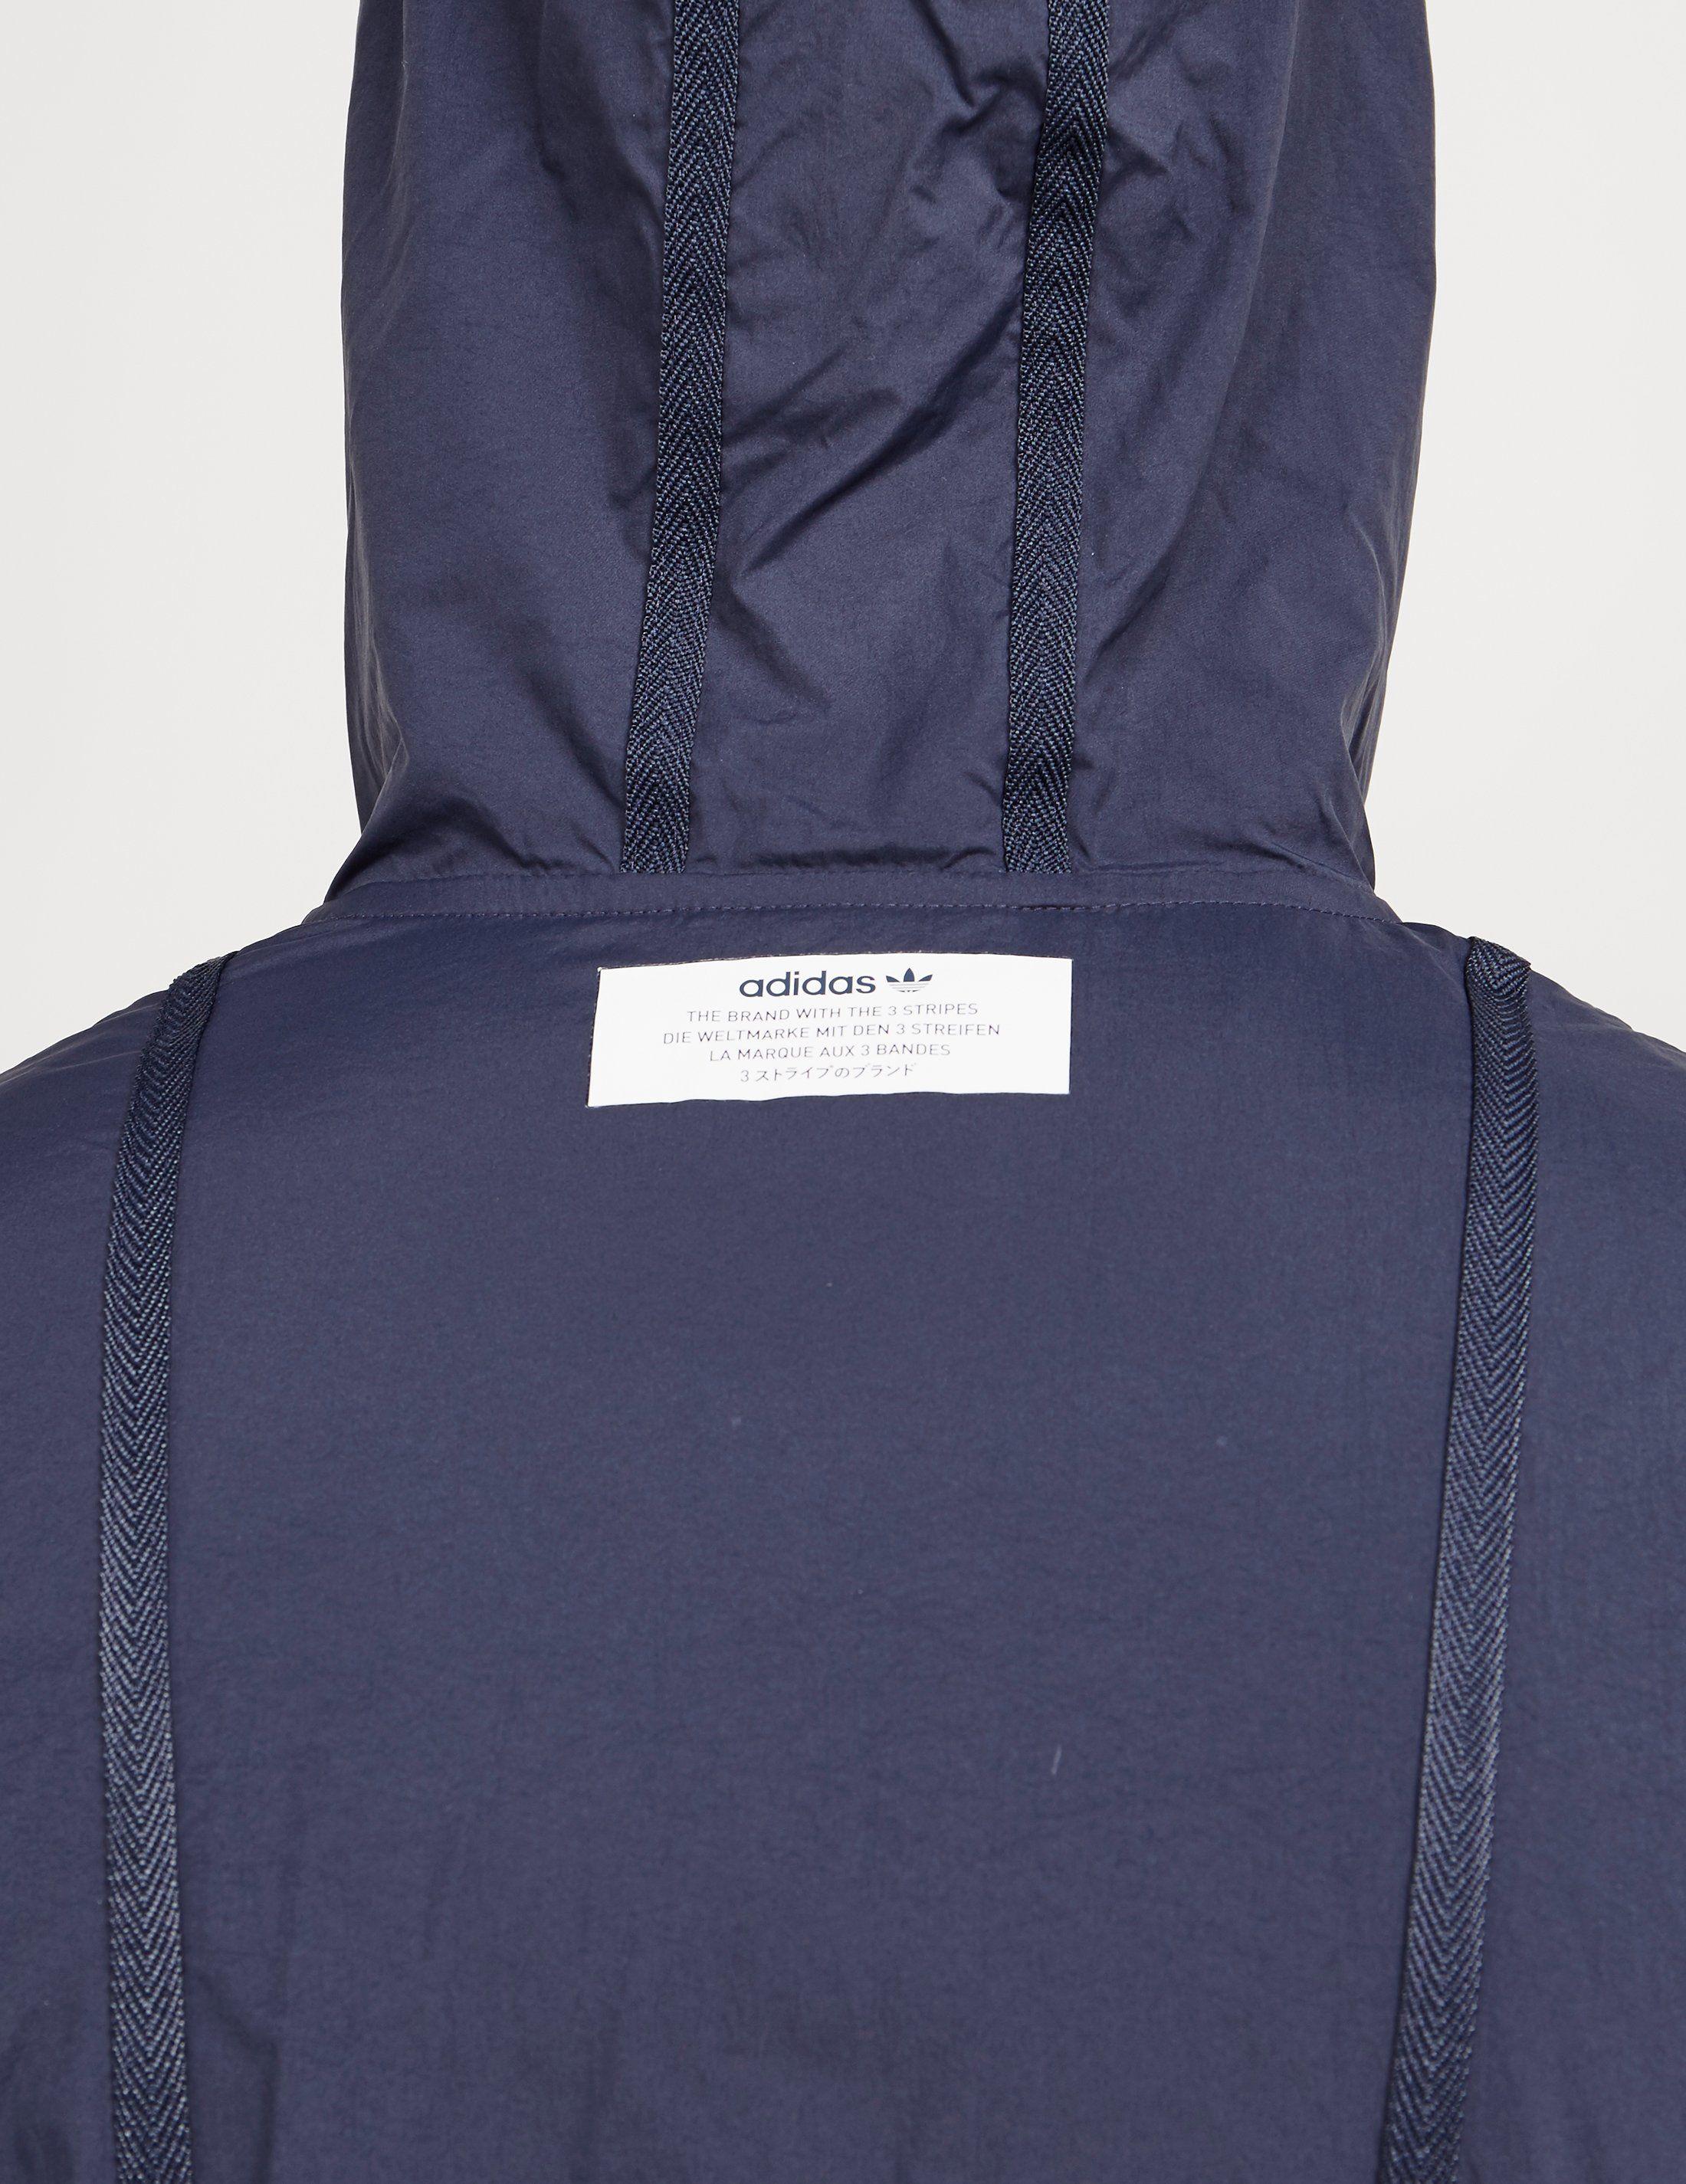 adidas Originals CLR84 Lightweight Windbreaker Jacket